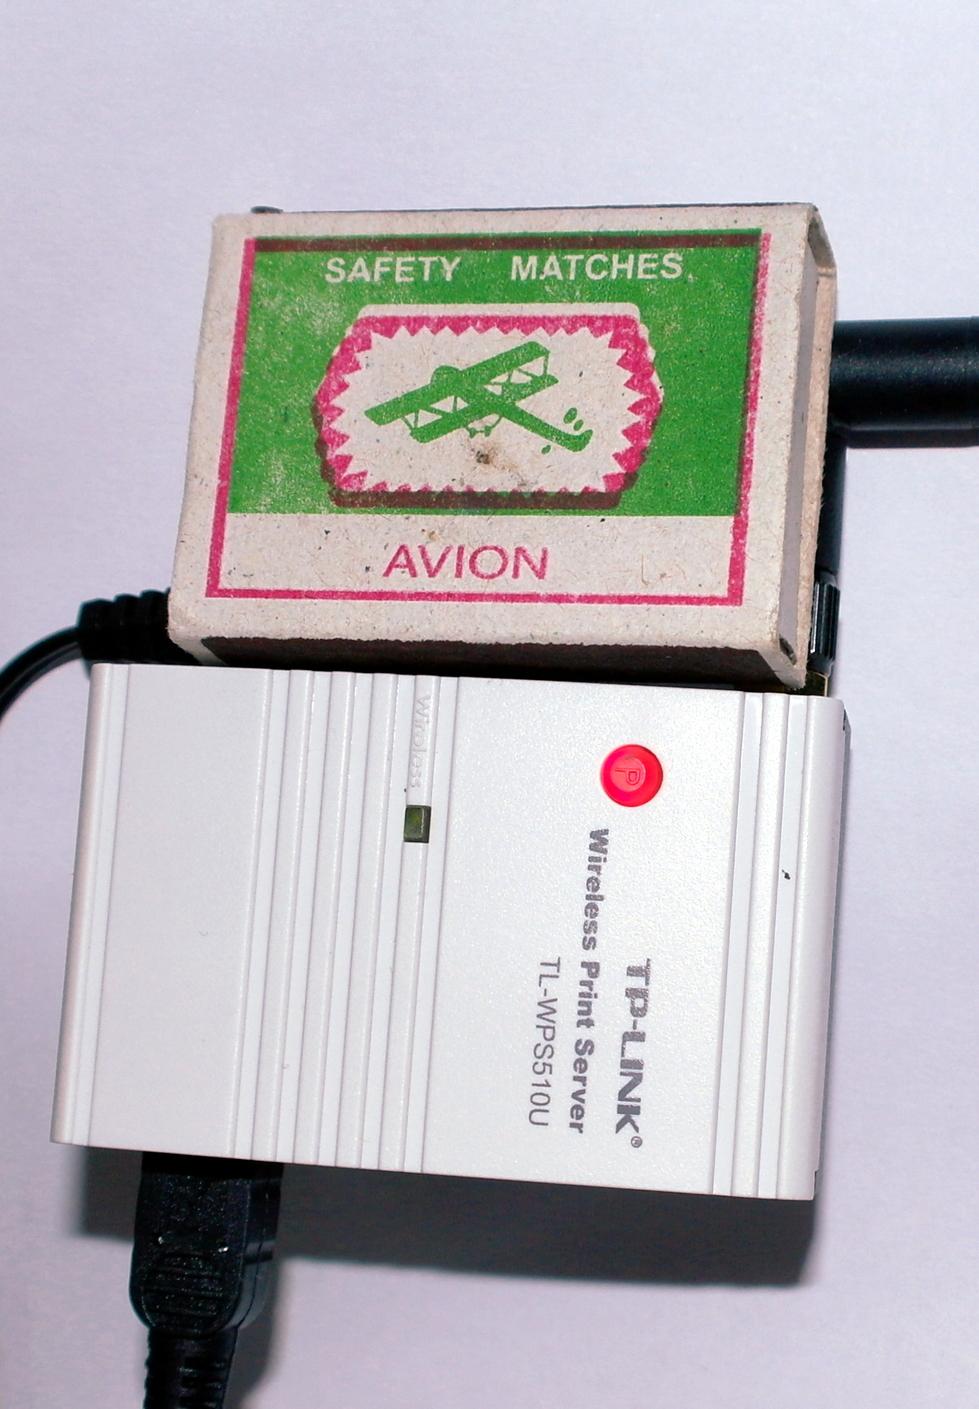 TL-WPS510U и коробок спичек